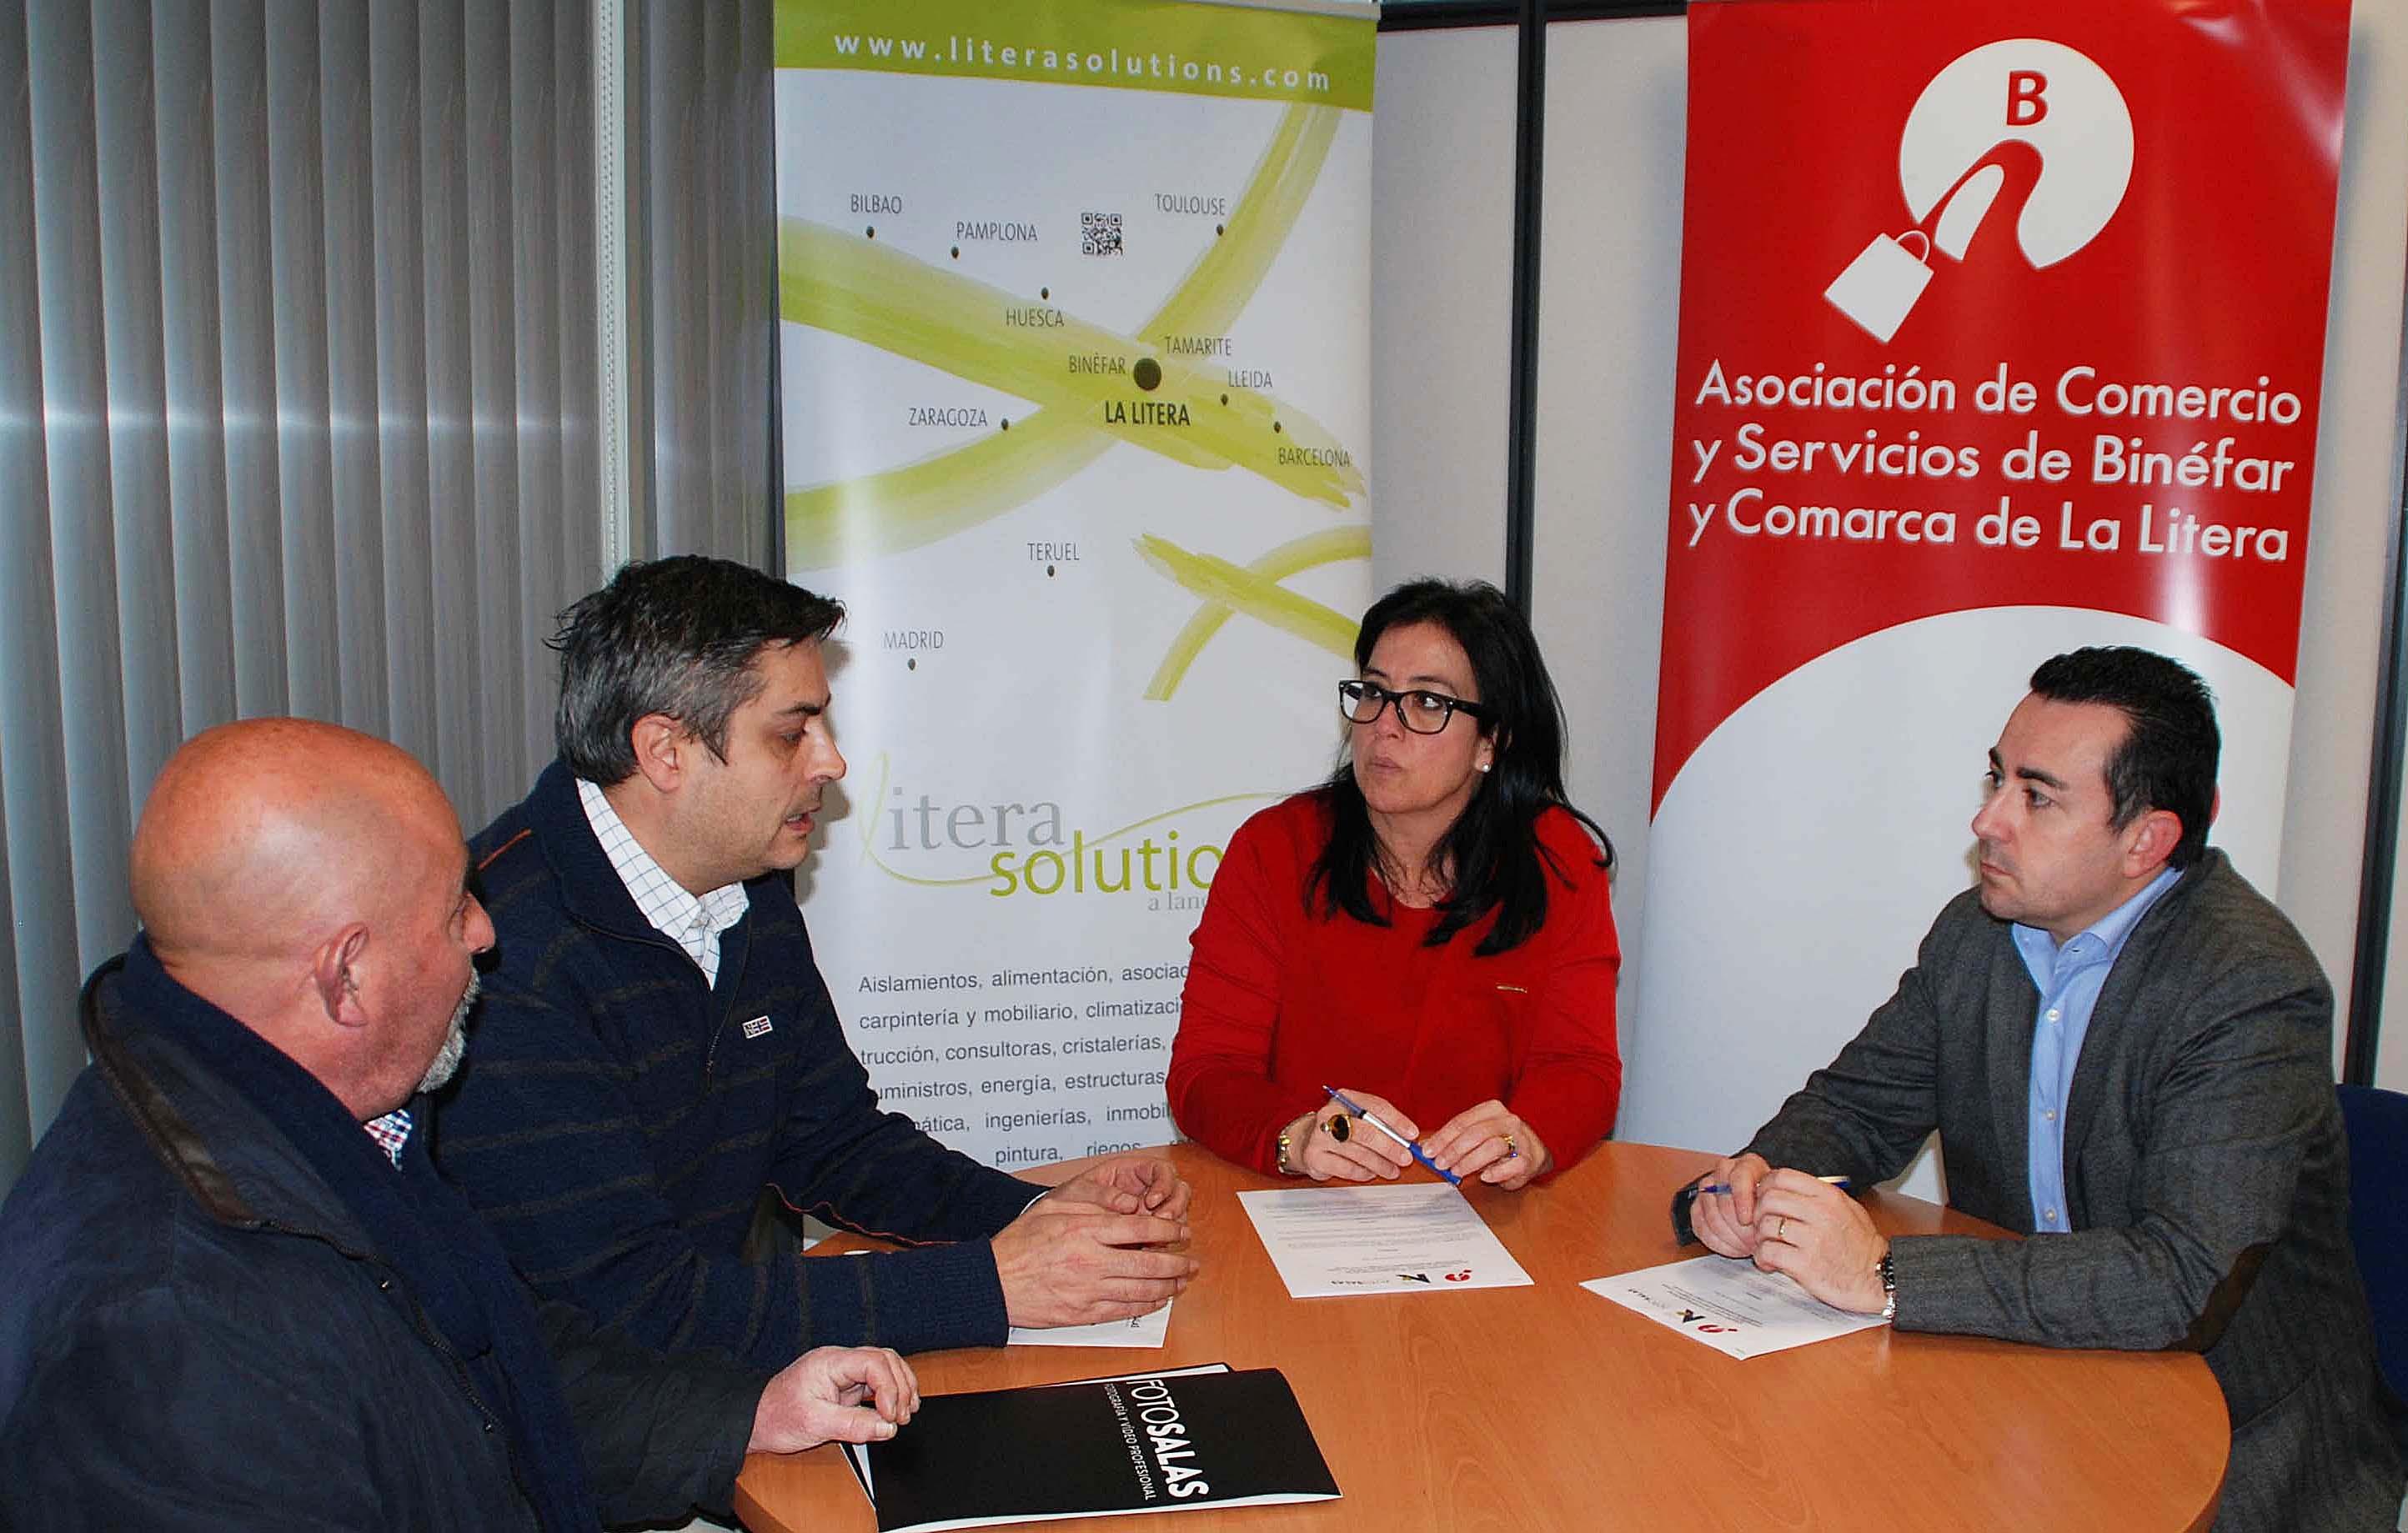 Cruz Roja de Binéfar promueve una iniciativa en memoria de José Javier Arias